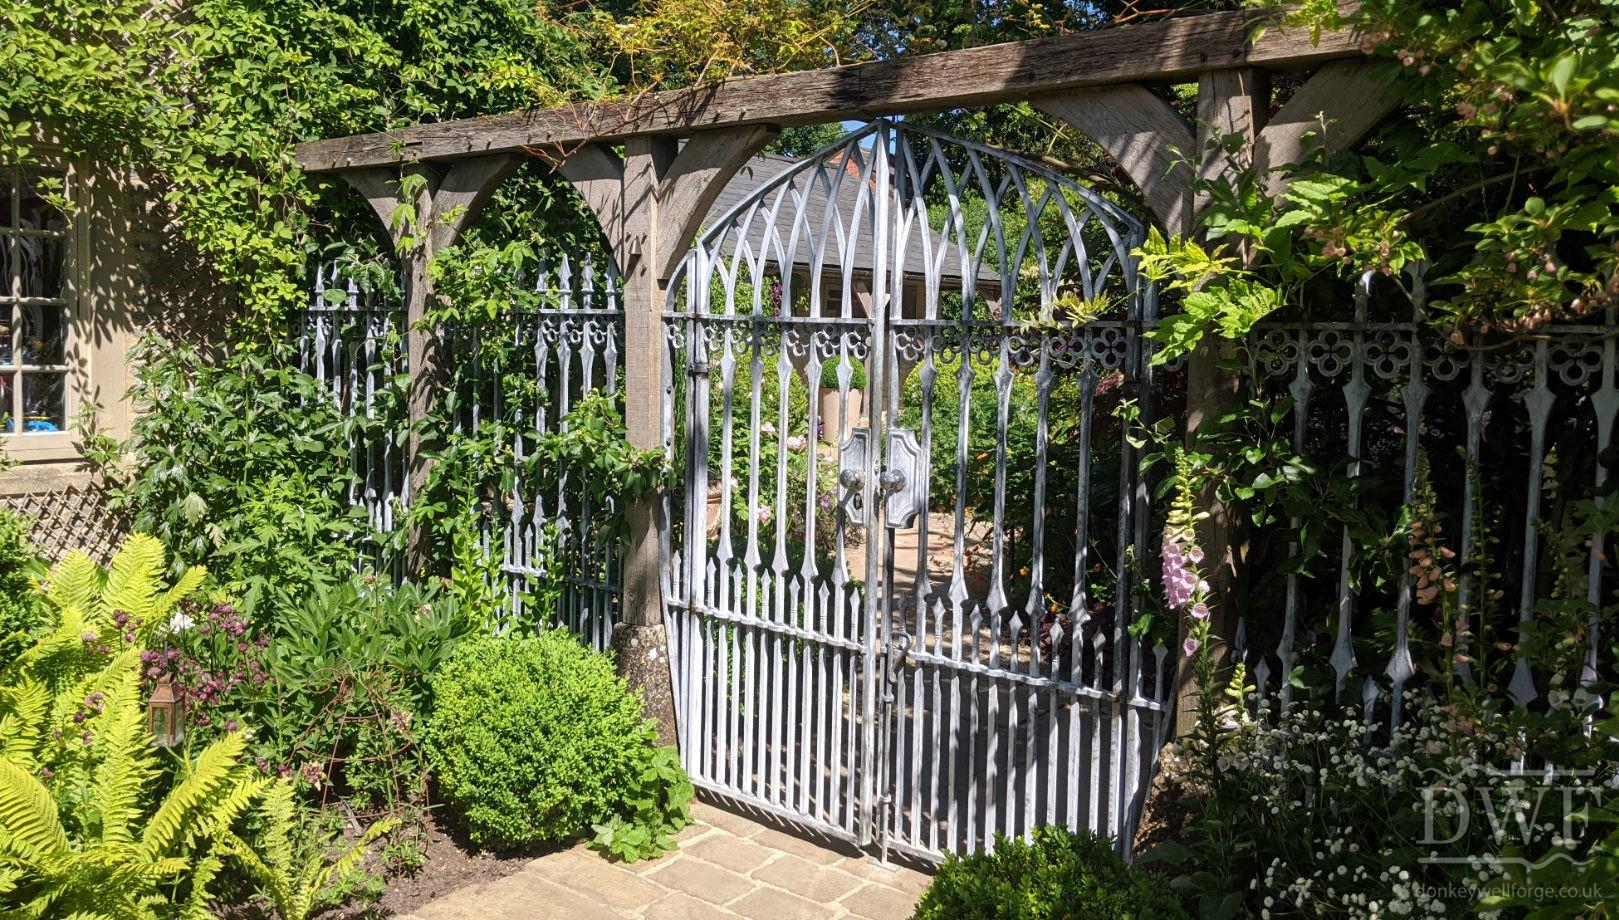 traditional-gothic-ironwork-lattice-forged-gates-railings-garden